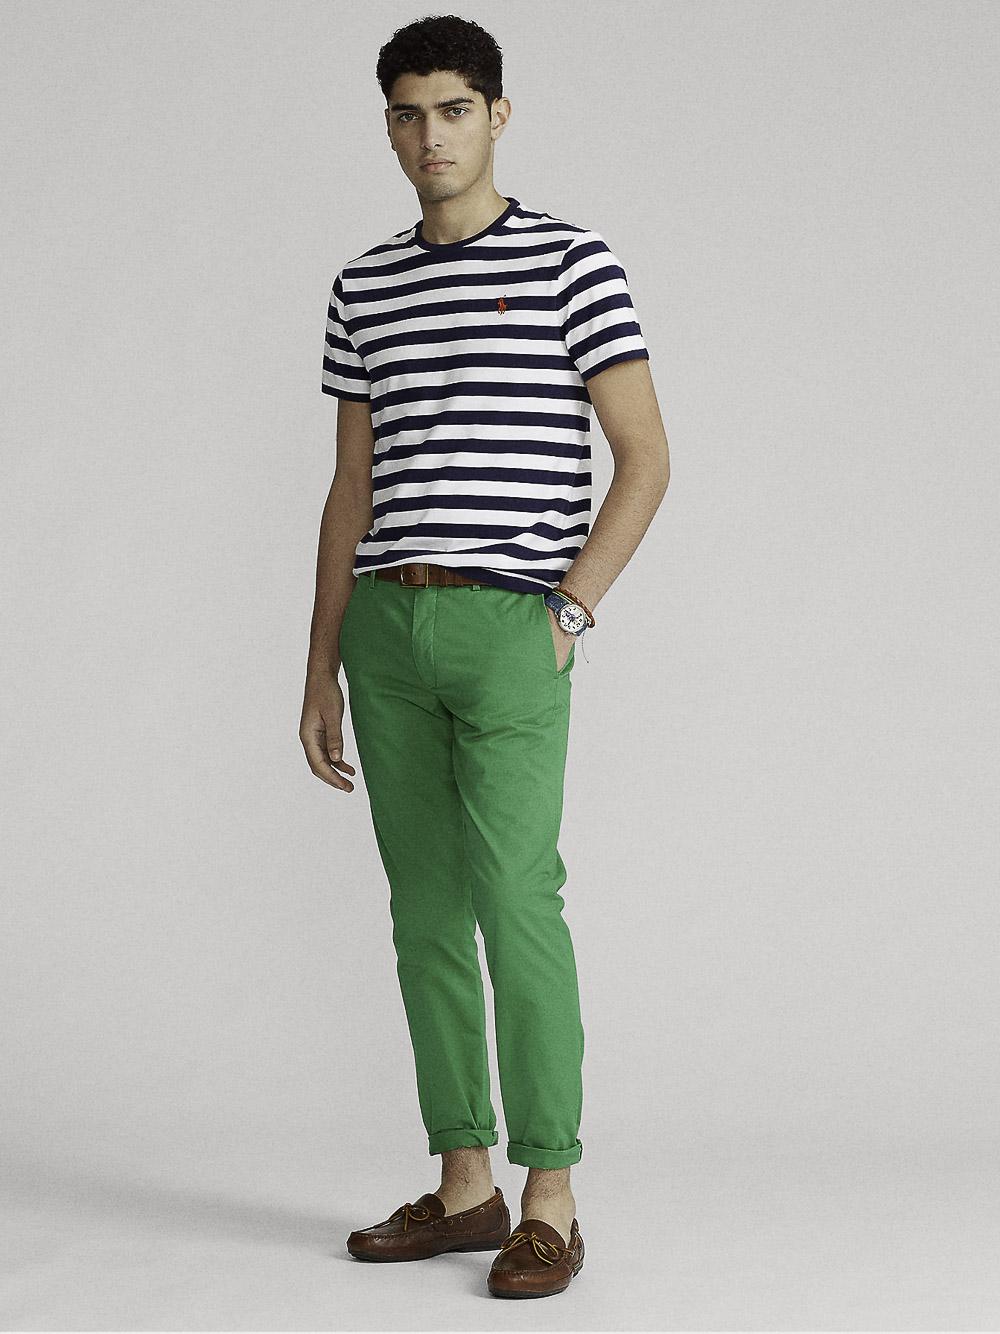 POLO RALPH LAUREN Μπλούζα T-Shirt 710823560002 ΡΙΓΕ ΜΠΛΕ